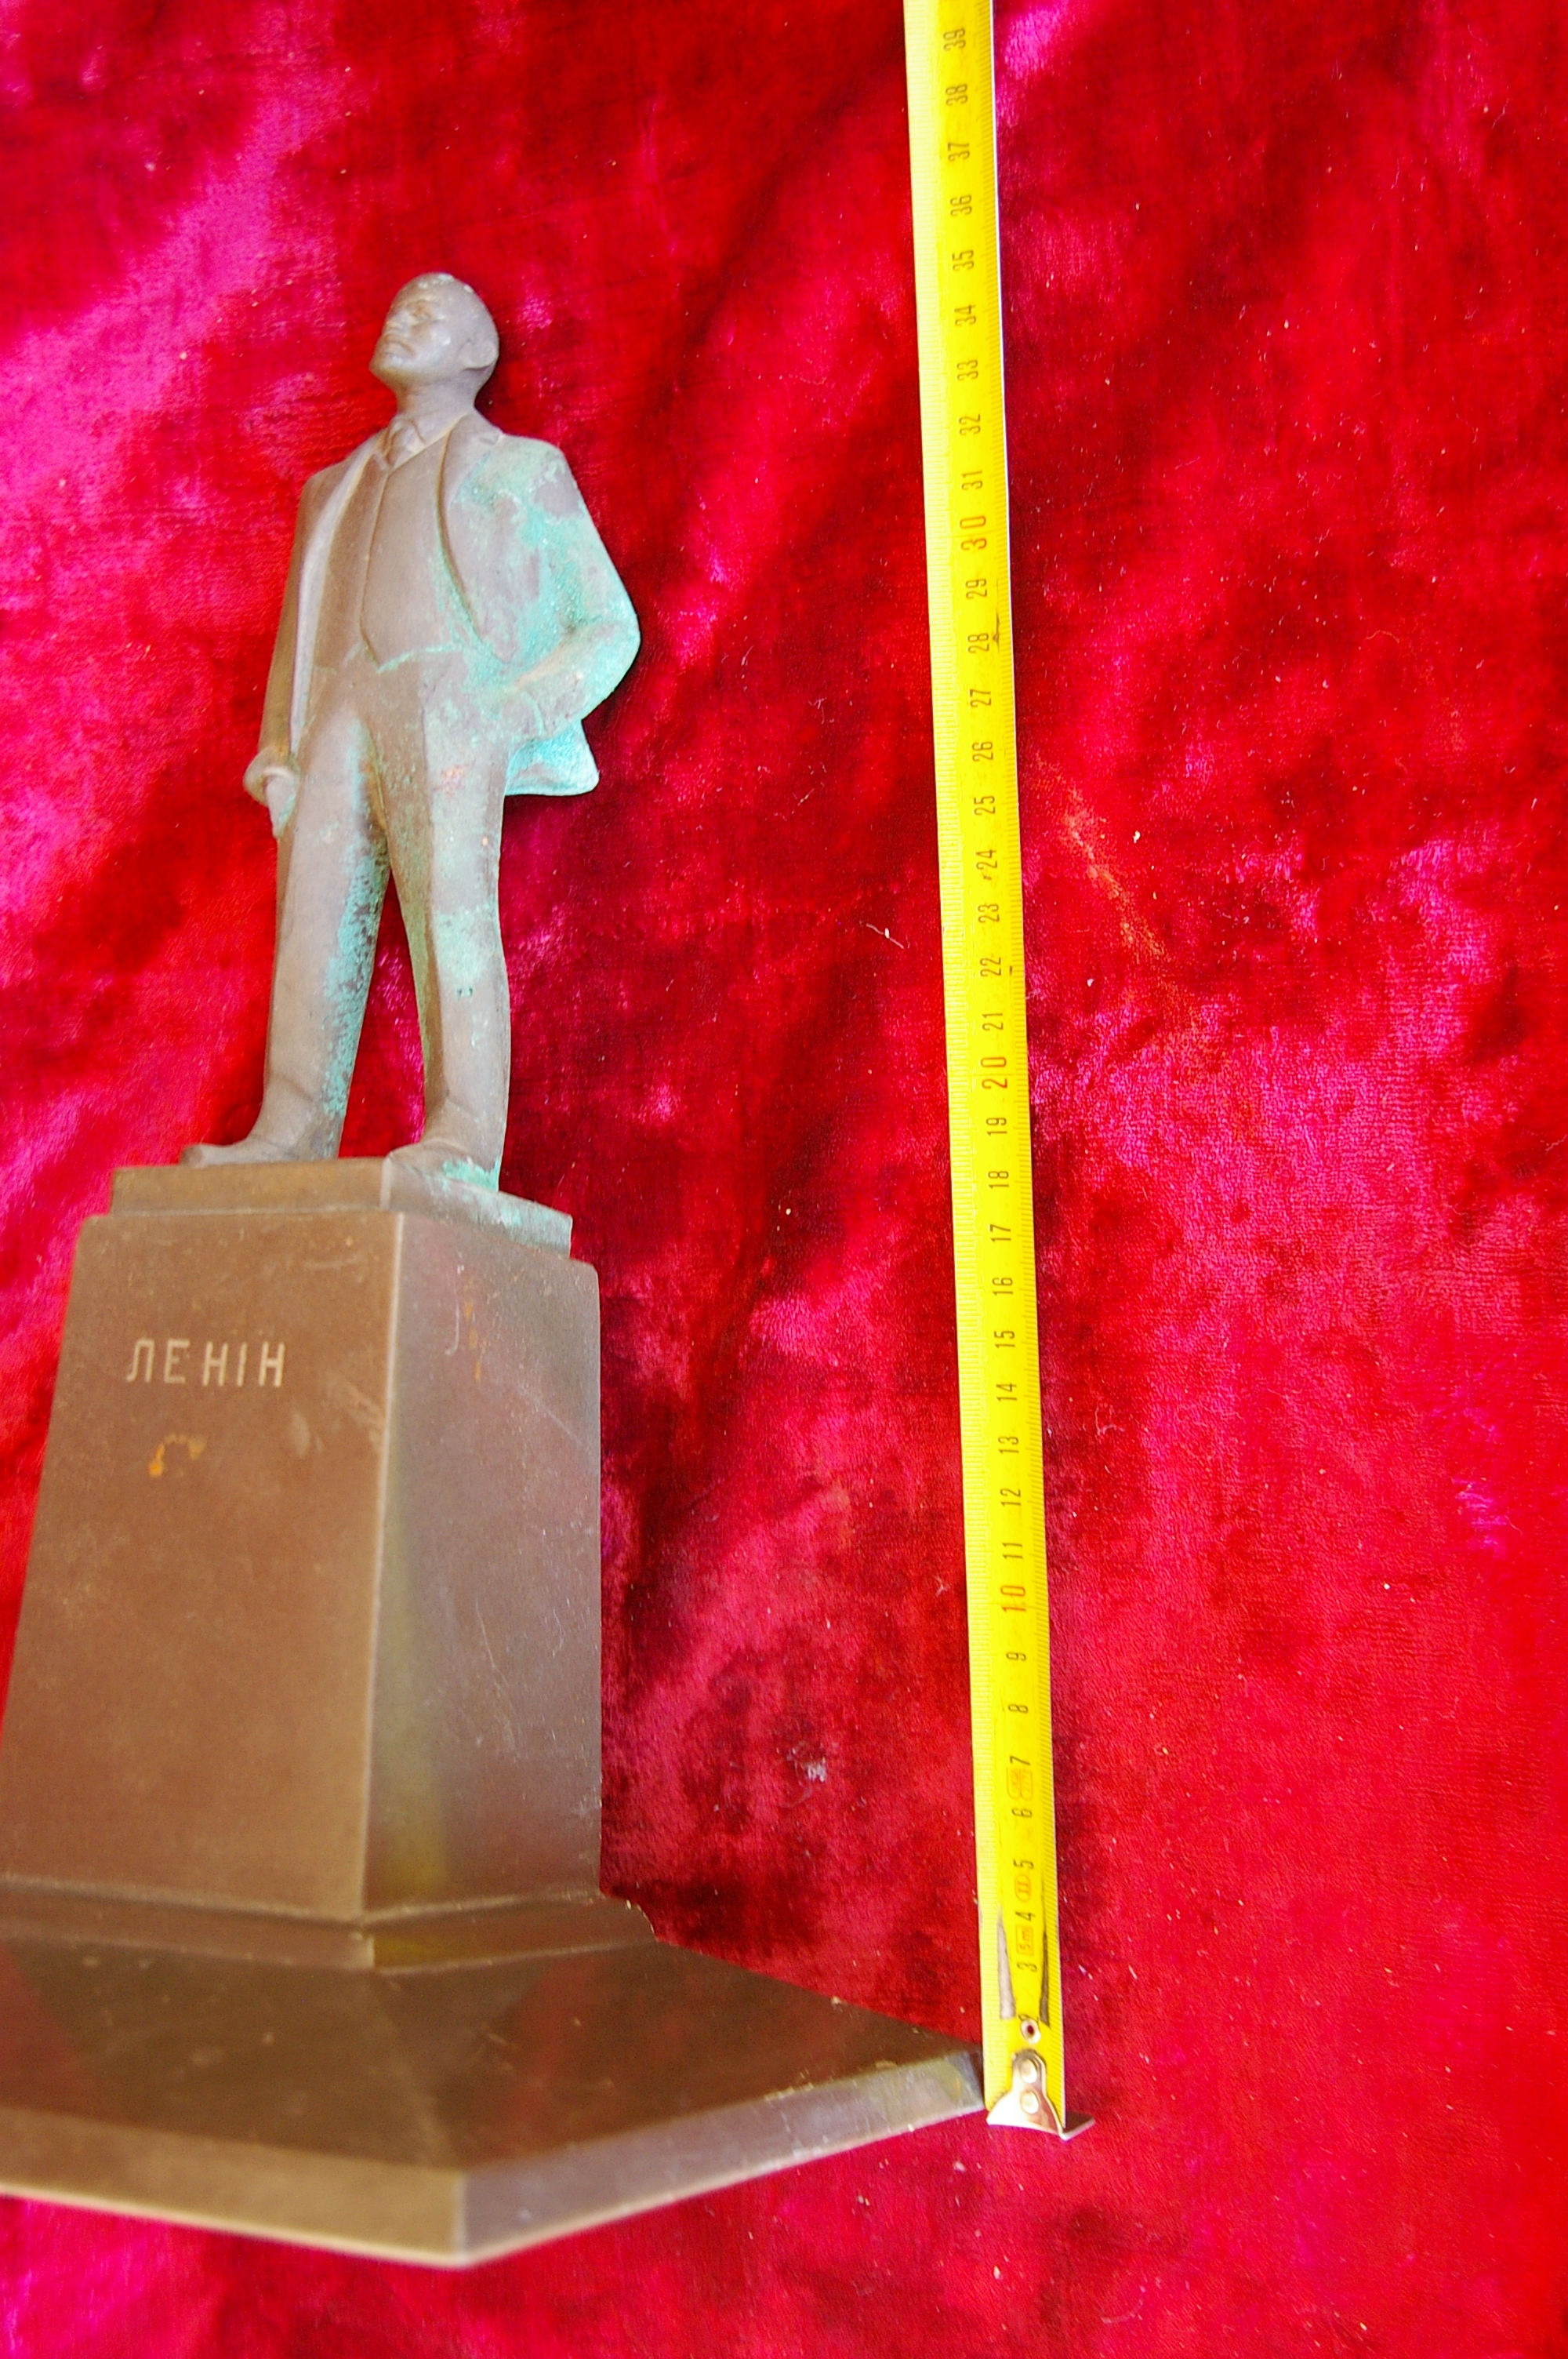 Скульптура Ленин на постаменте, материал бронза, высота 35 см., ширина 20 см., длина 20 см. - 9